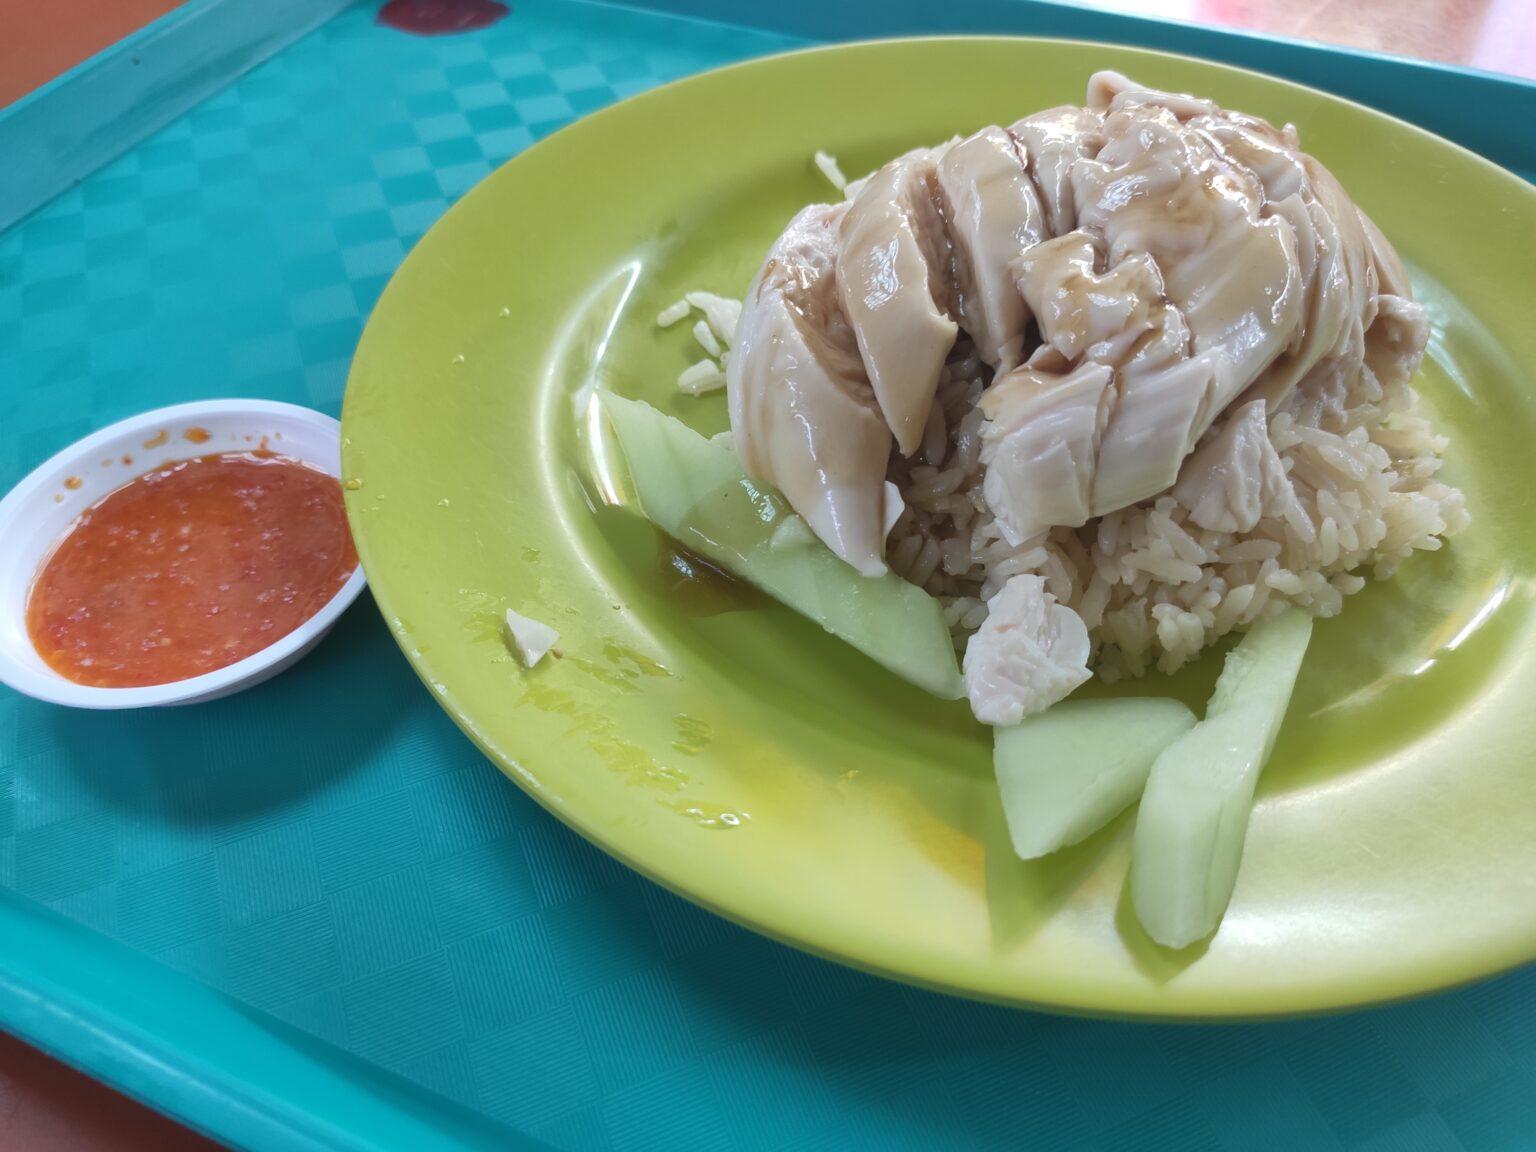 Review: Tian Tian Hainanese Chicken Rice (Singapore)